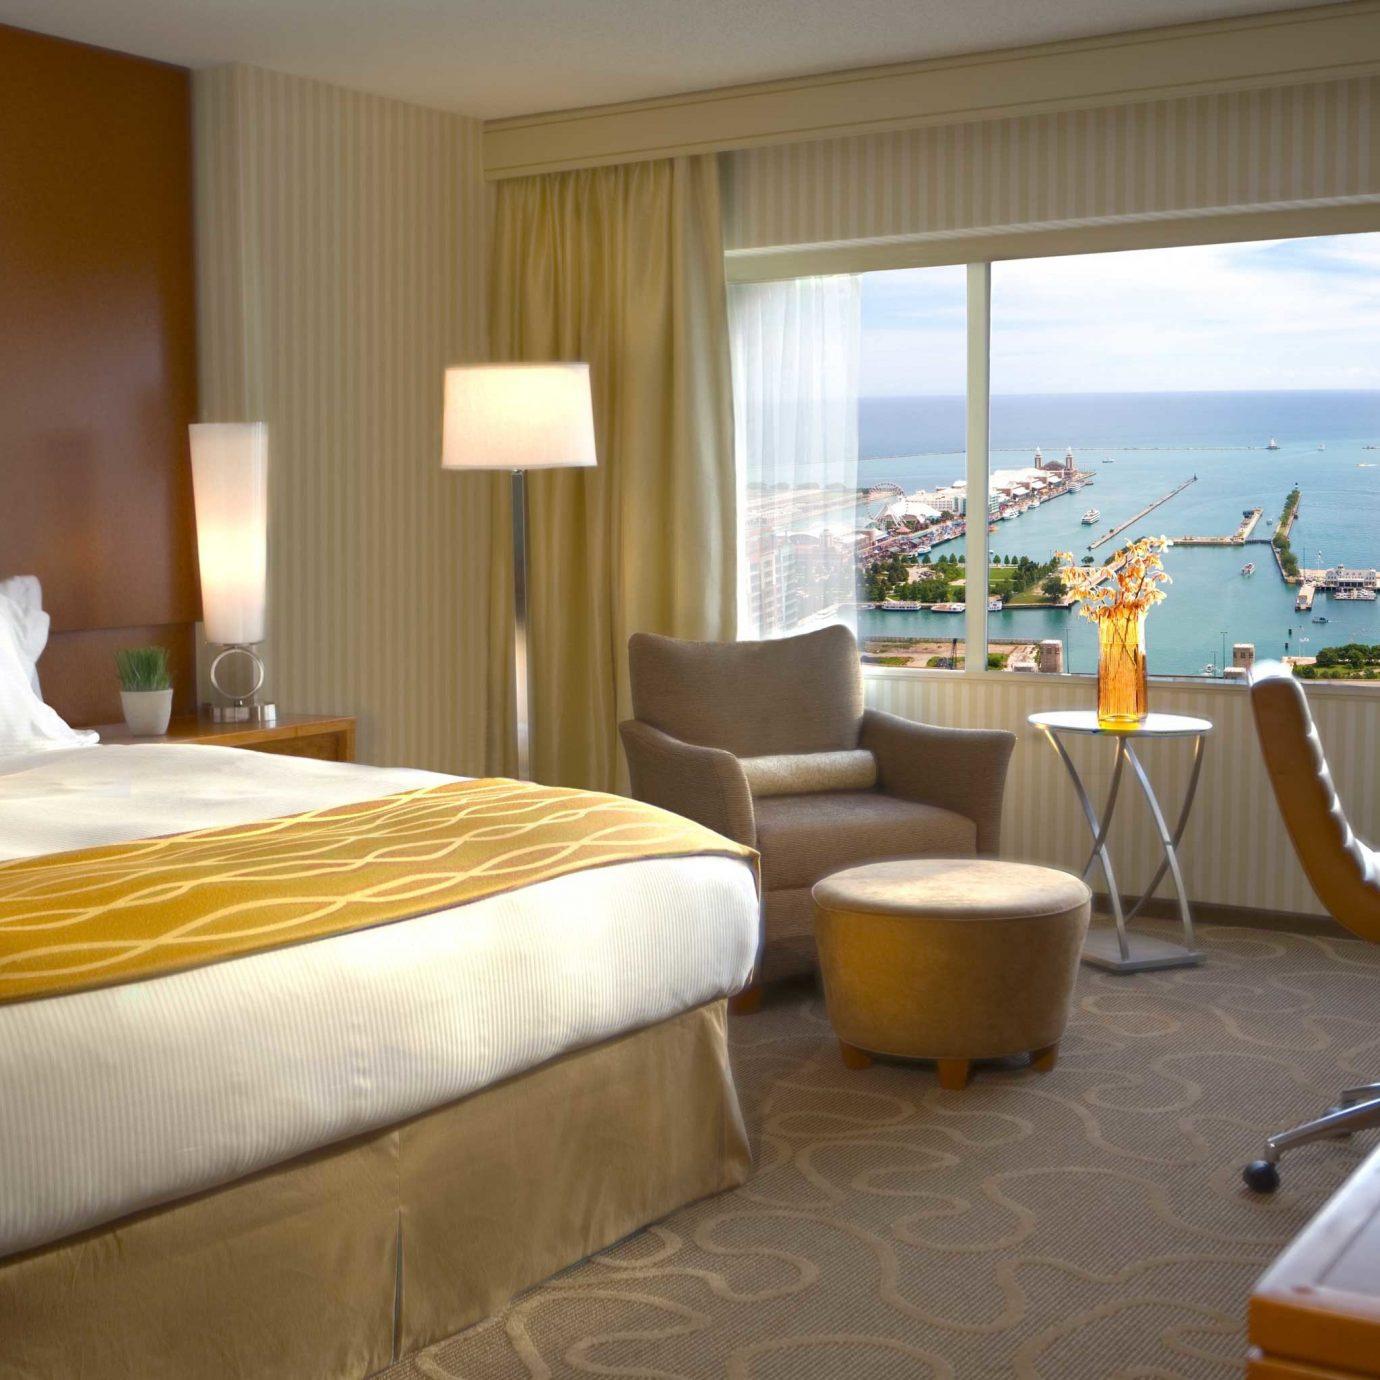 Bedroom Luxury Scenic views Suite property Resort Villa cottage condominium nice